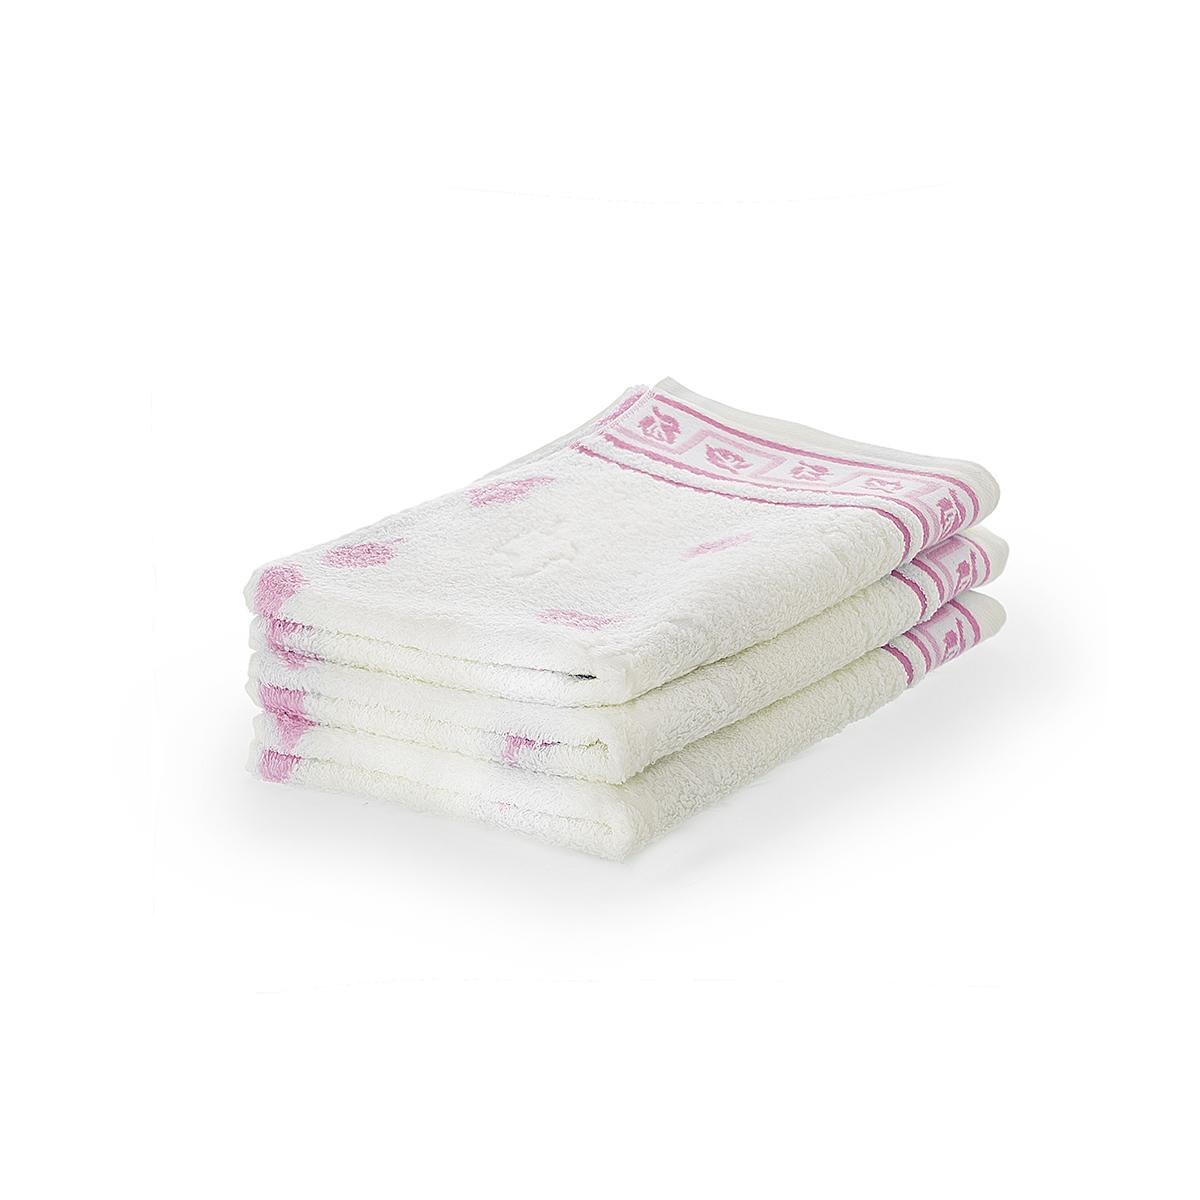 Полотенце Листопад Розовый, размер 34х78 смМахровые полотенца<br>Плотность ткани:480 г/кв. м.<br><br>Тип: Полотенце<br>Размер: 34х78<br>Материал: Махра